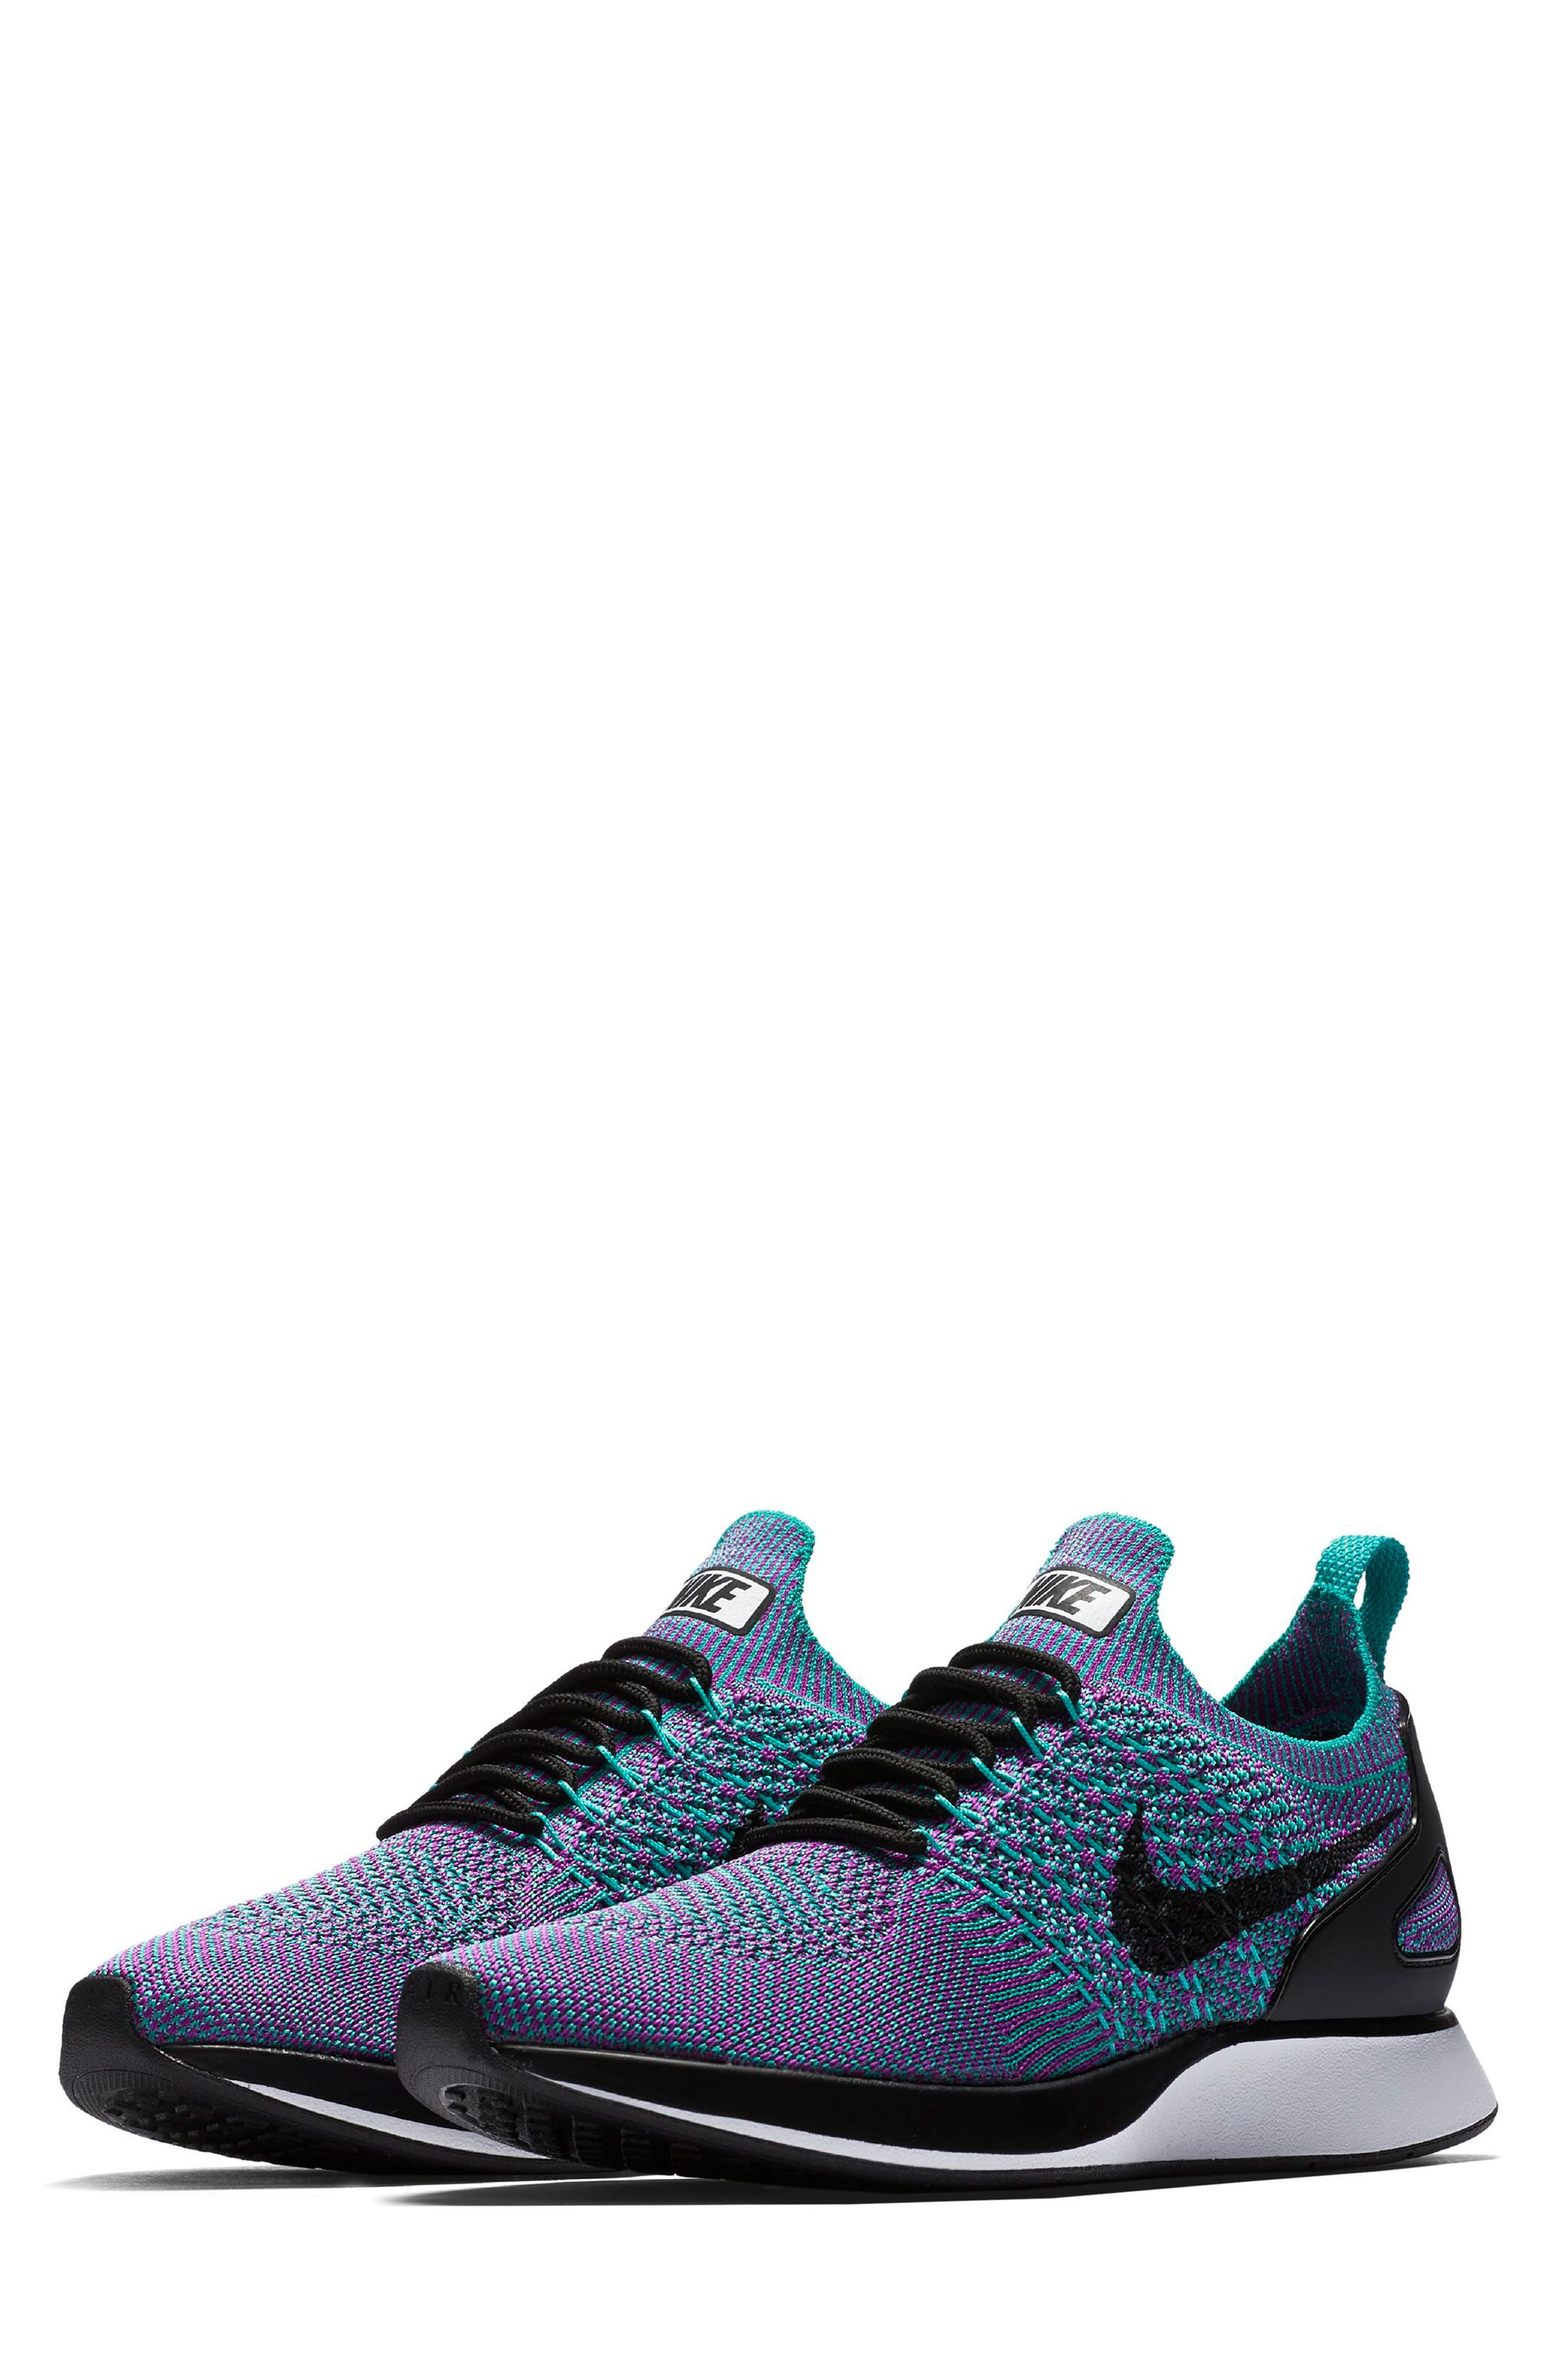 Air Zoom Mariah Flyknit Racer Sneaker,                             Main thumbnail 1, color,                             CLEAR JADE/ BLACK